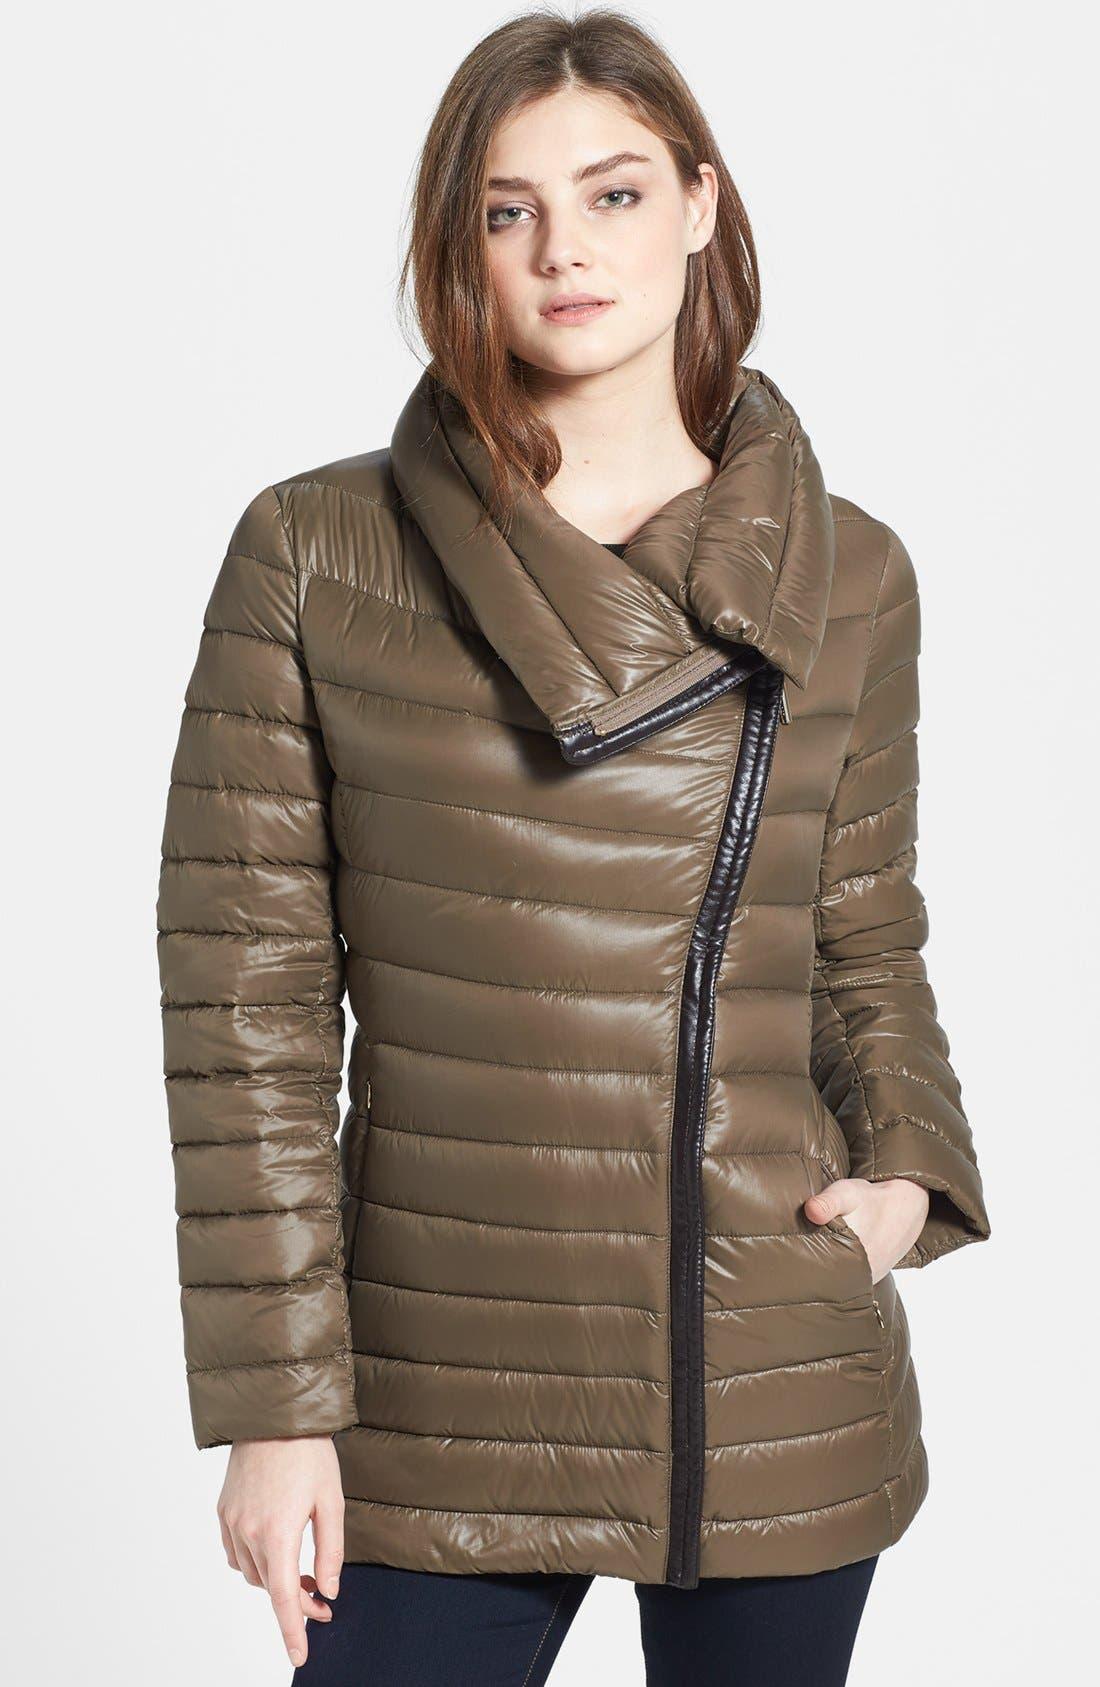 Alternate Image 1 Selected - Calvin Klein Lightweight Asymmetric Down Jacket (Online Only)